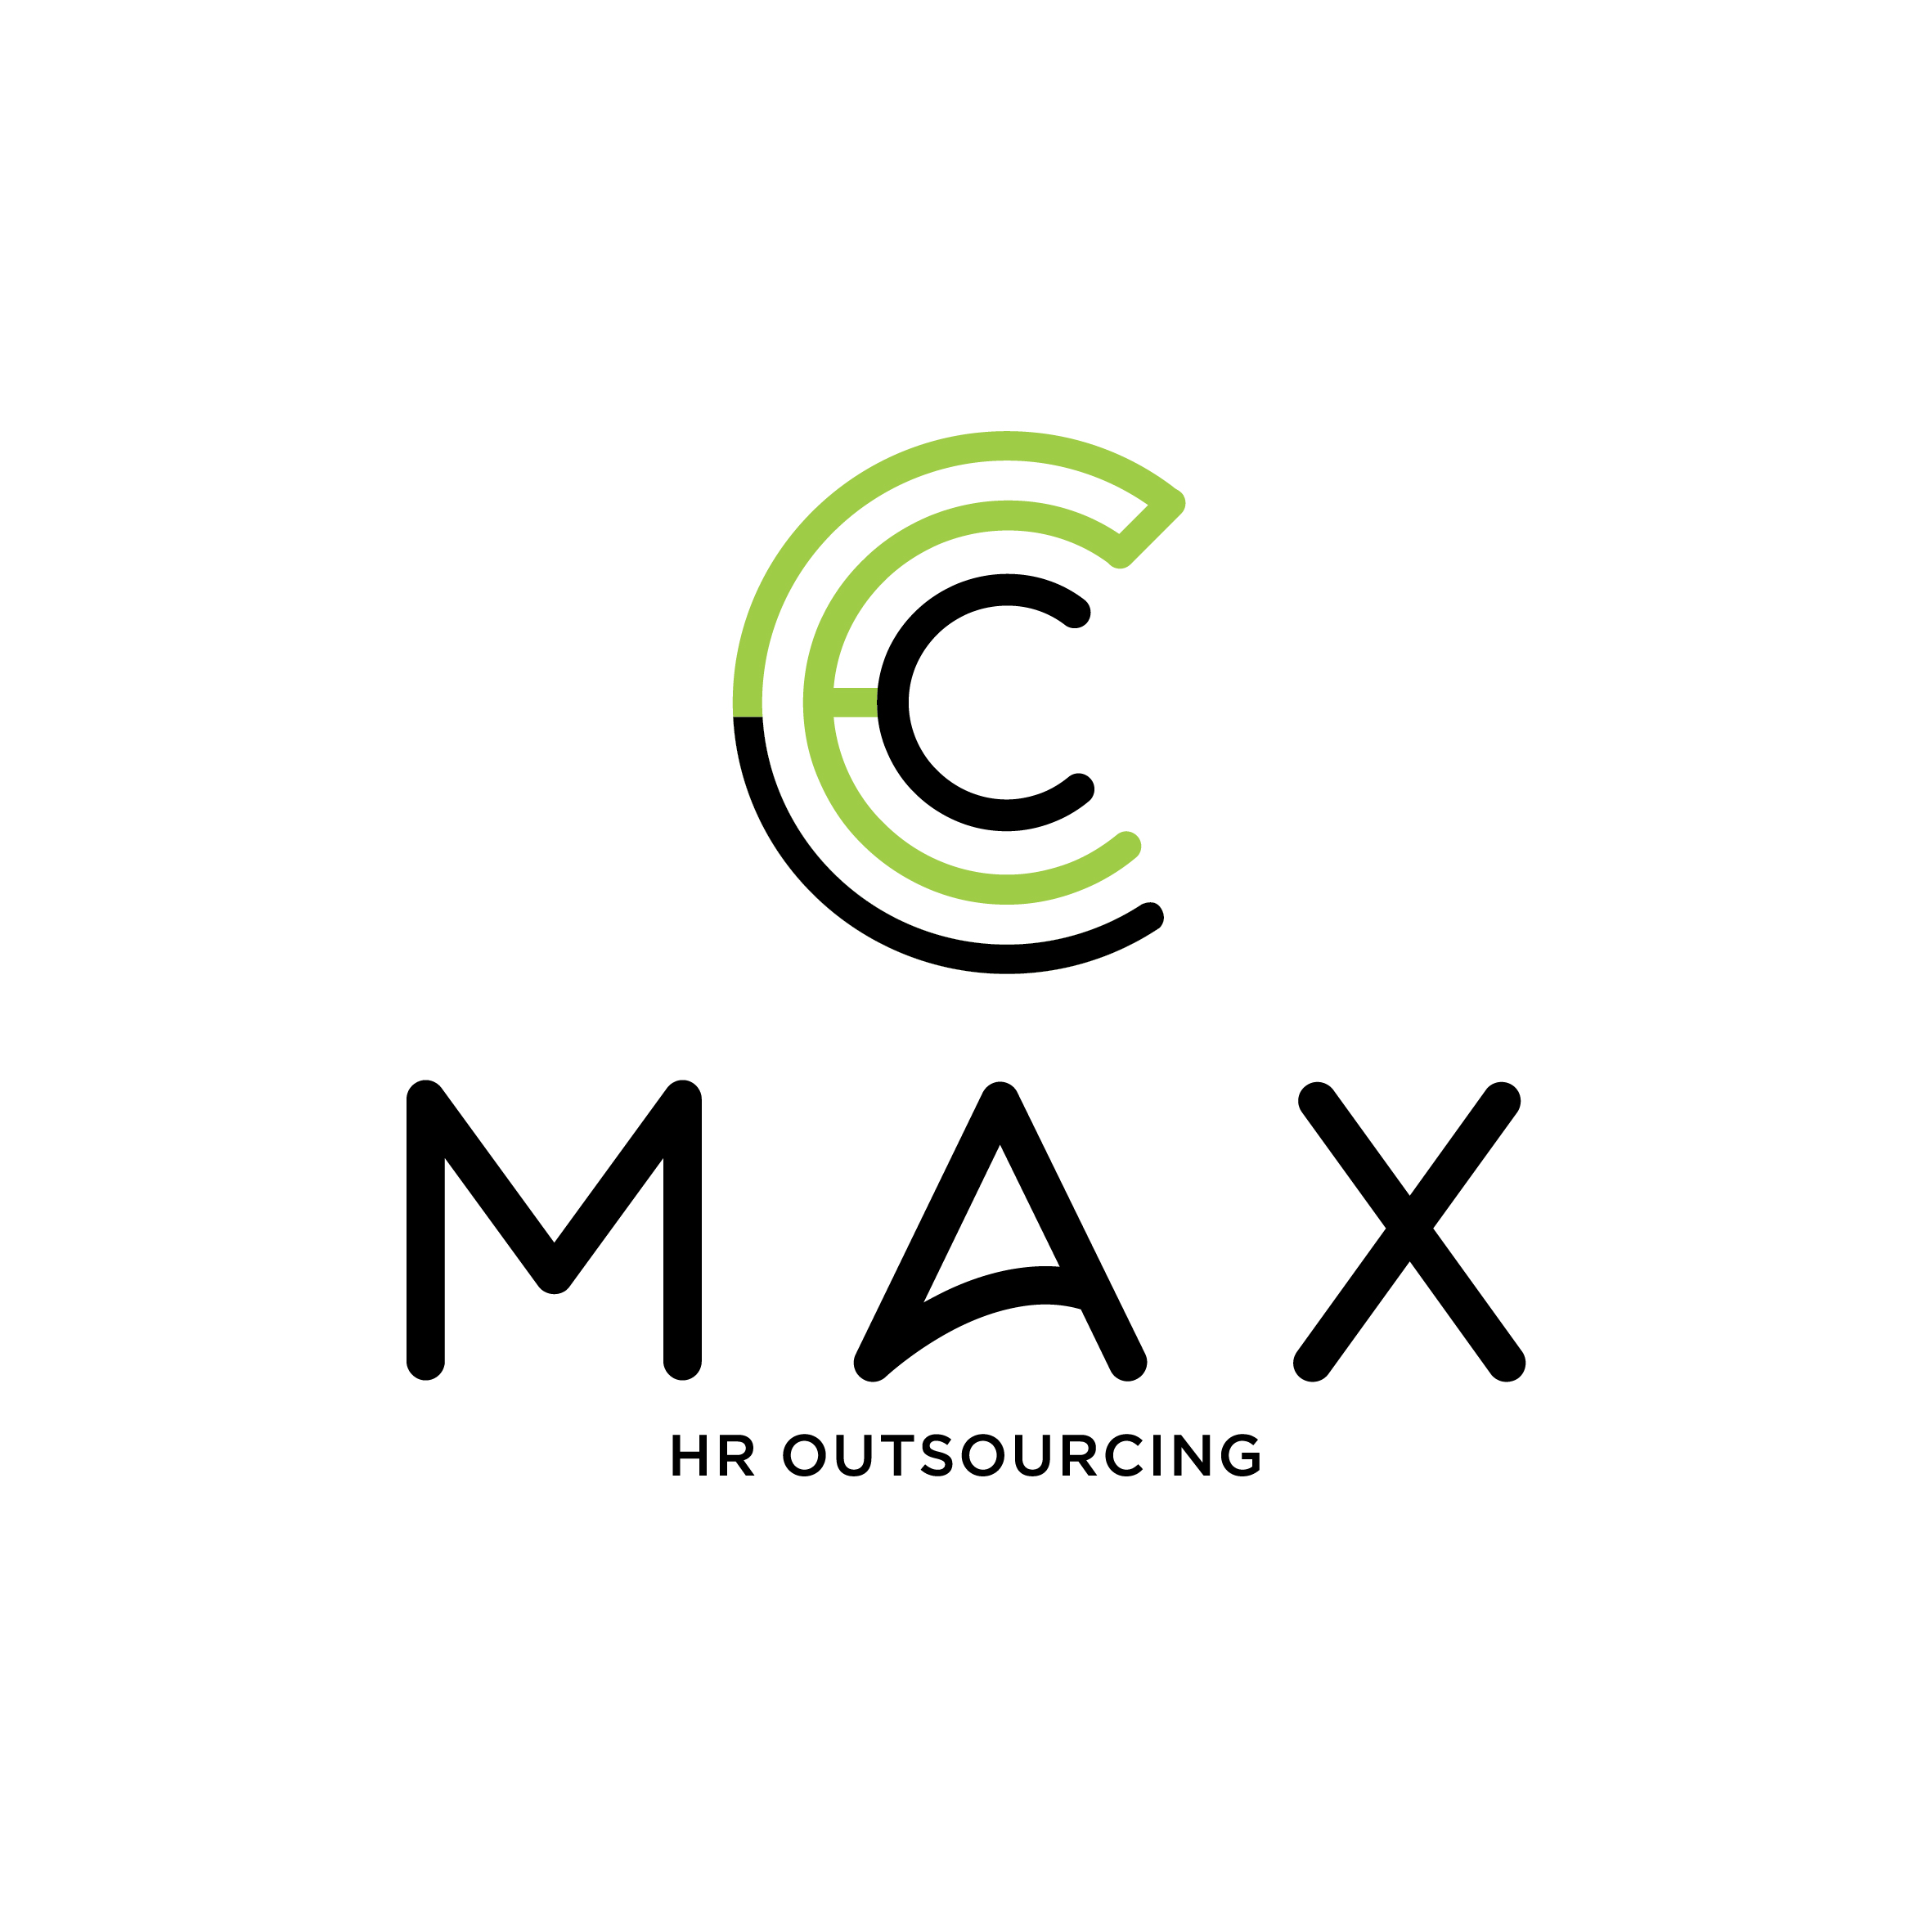 logo_Cmax_HRO-01.jpg